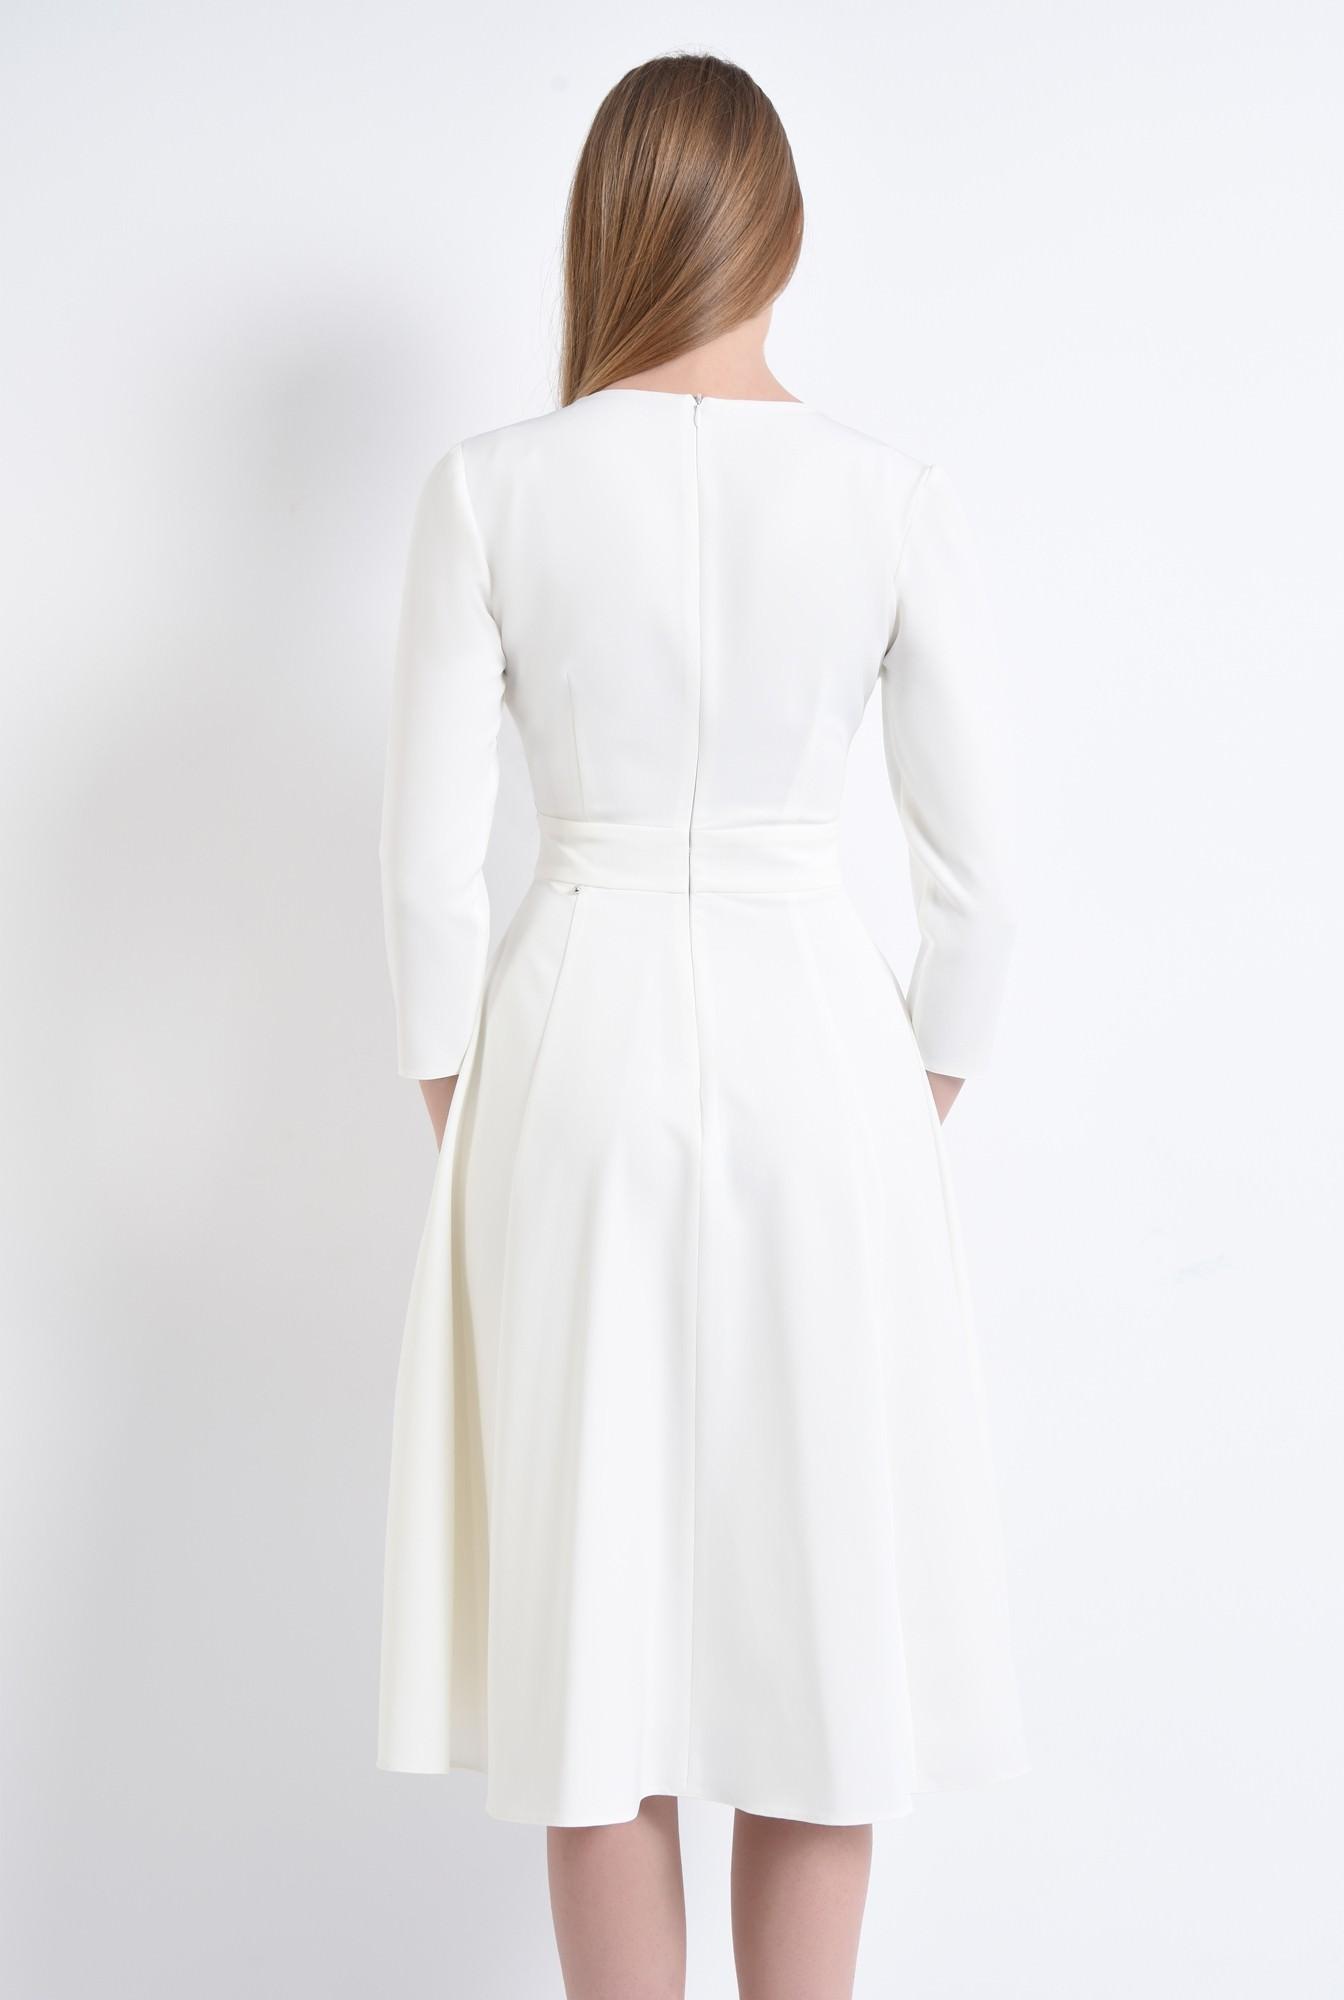 1 - Rochie eleganta, cu funda